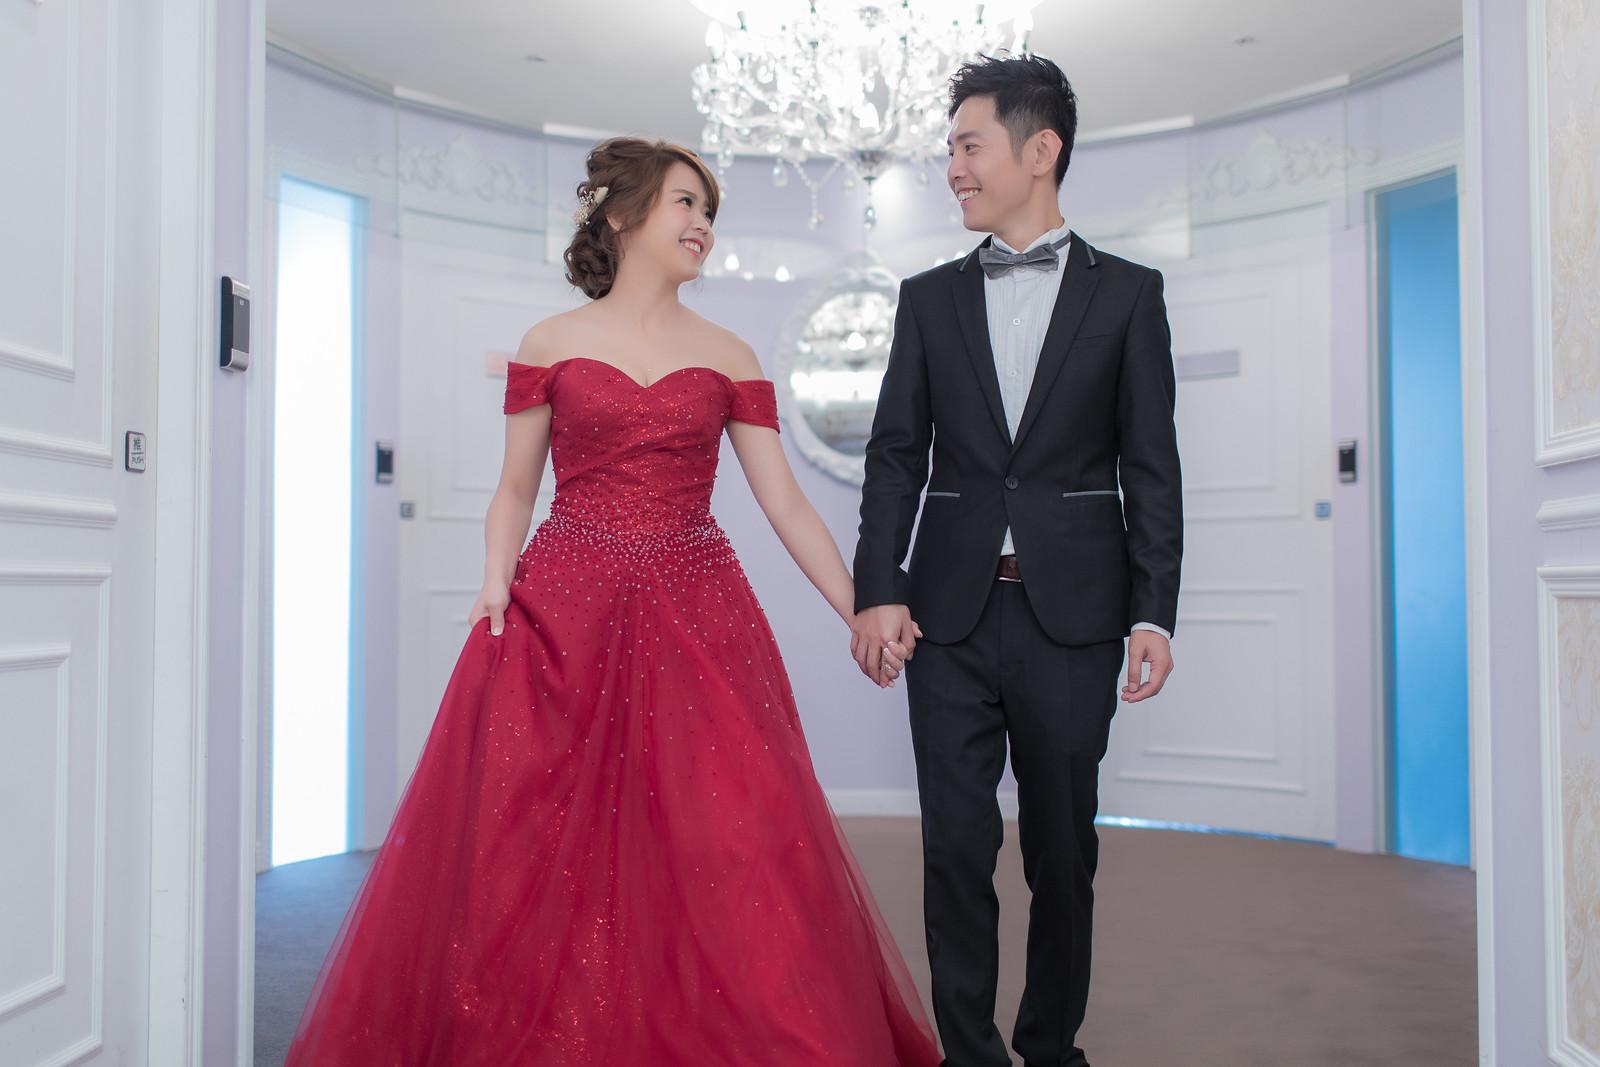 wedding20181110_0016